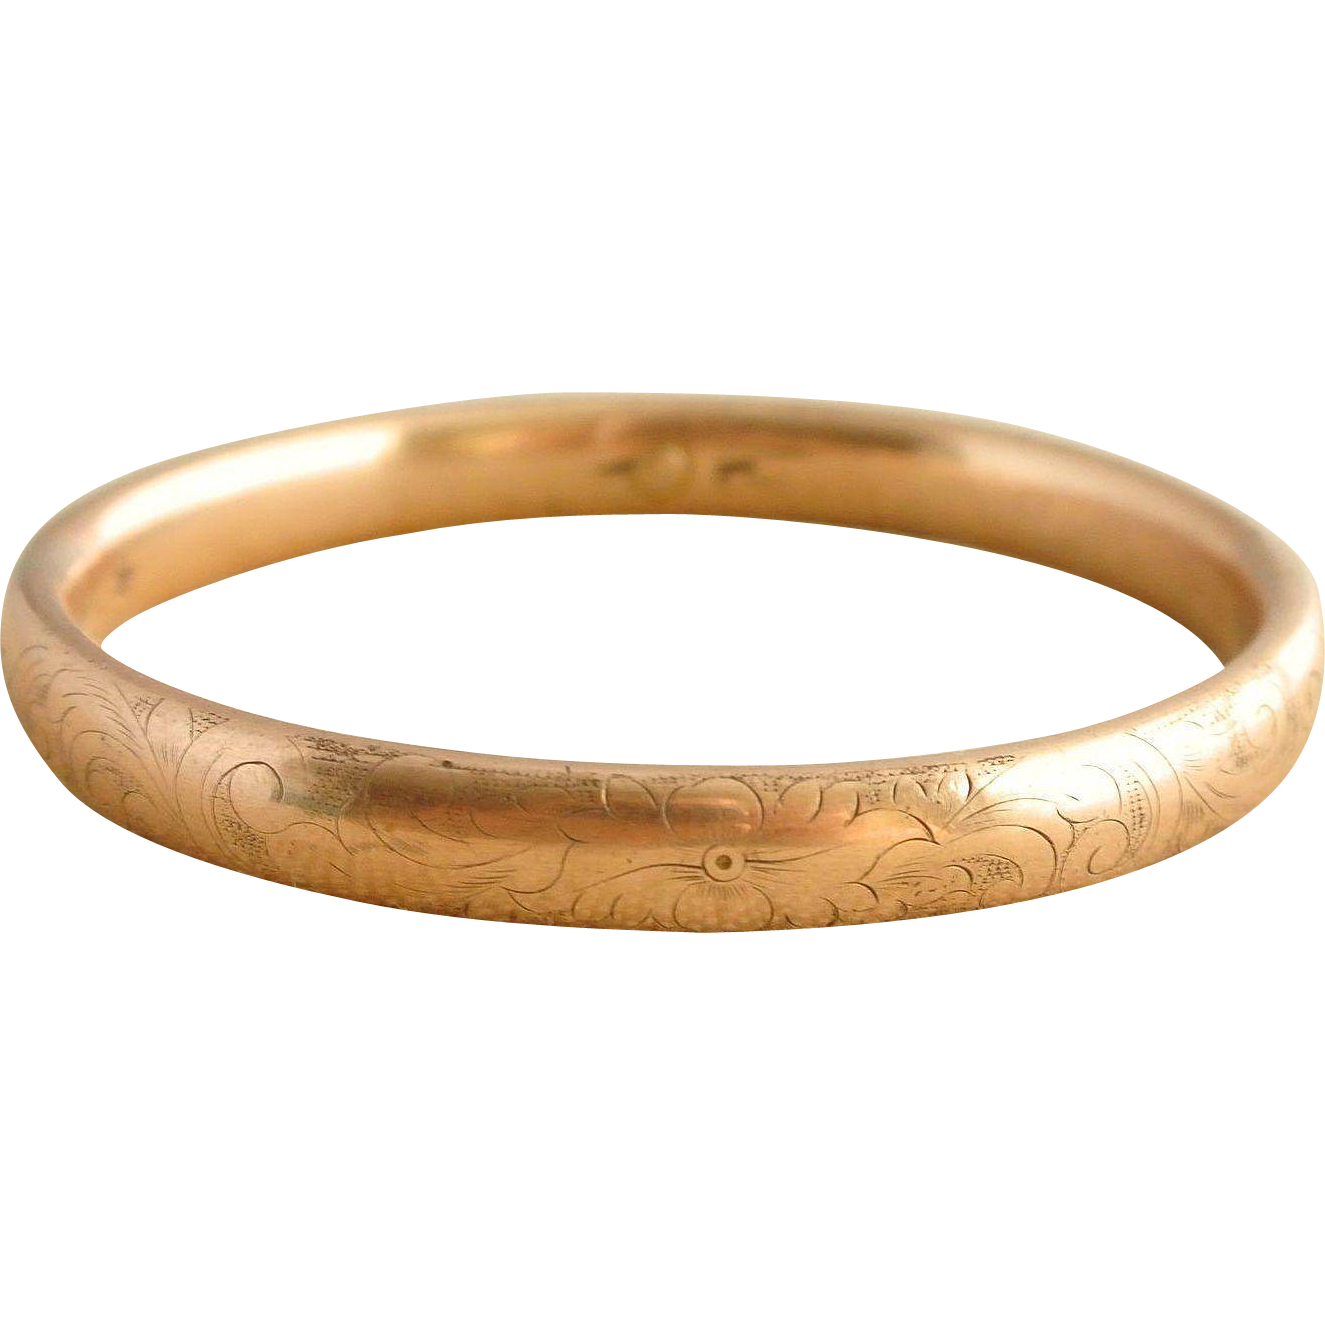 Gold-Filled Victorian Child's Hallmarked Bangle Bracelet